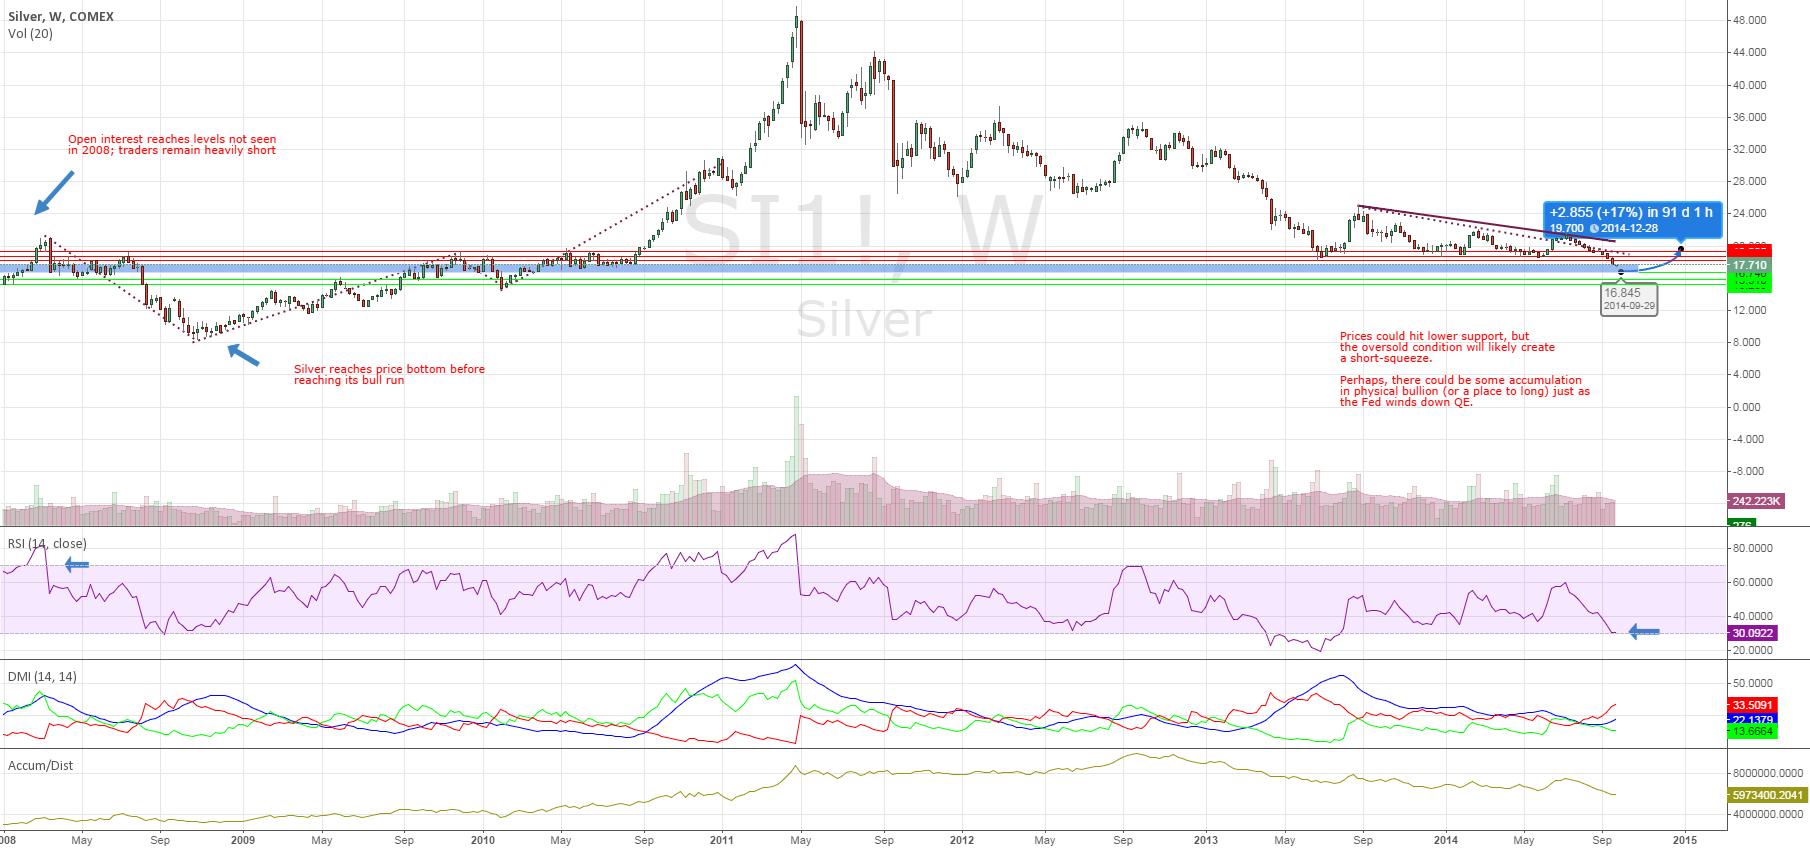 Silver Open Interest Reach 2008-Levels, Speculators Remain Short